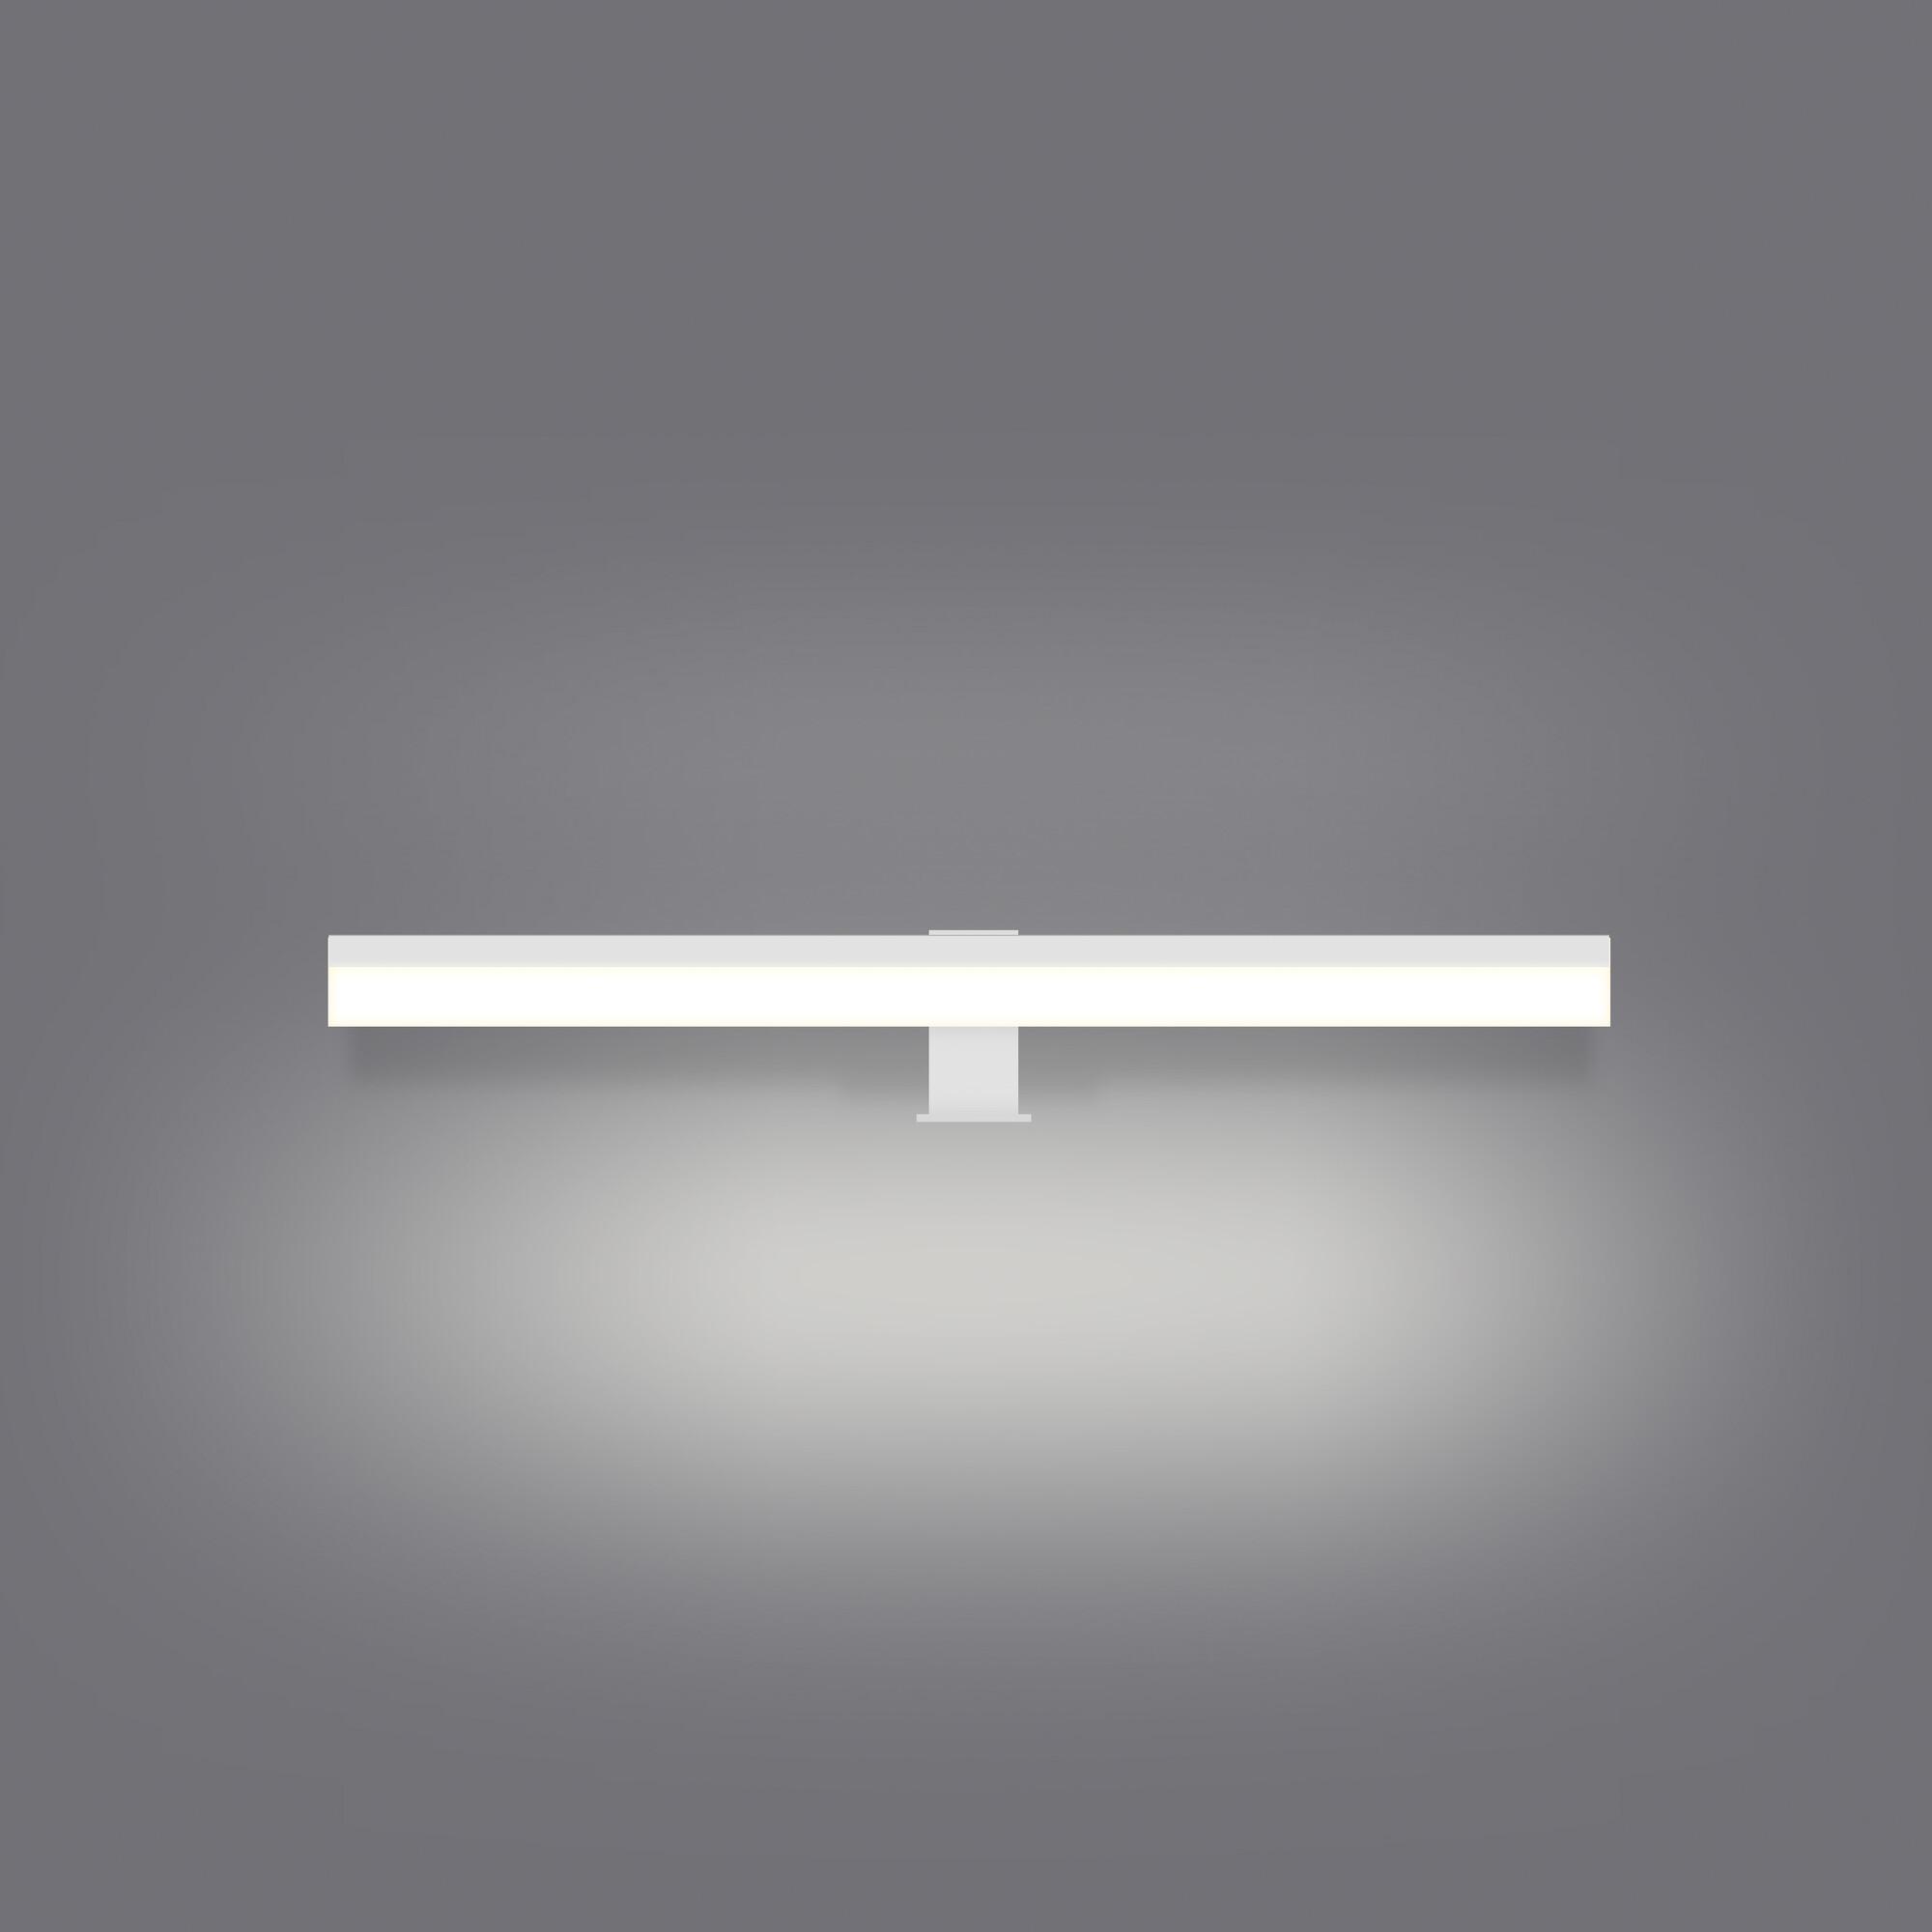 DECADE wandlampen